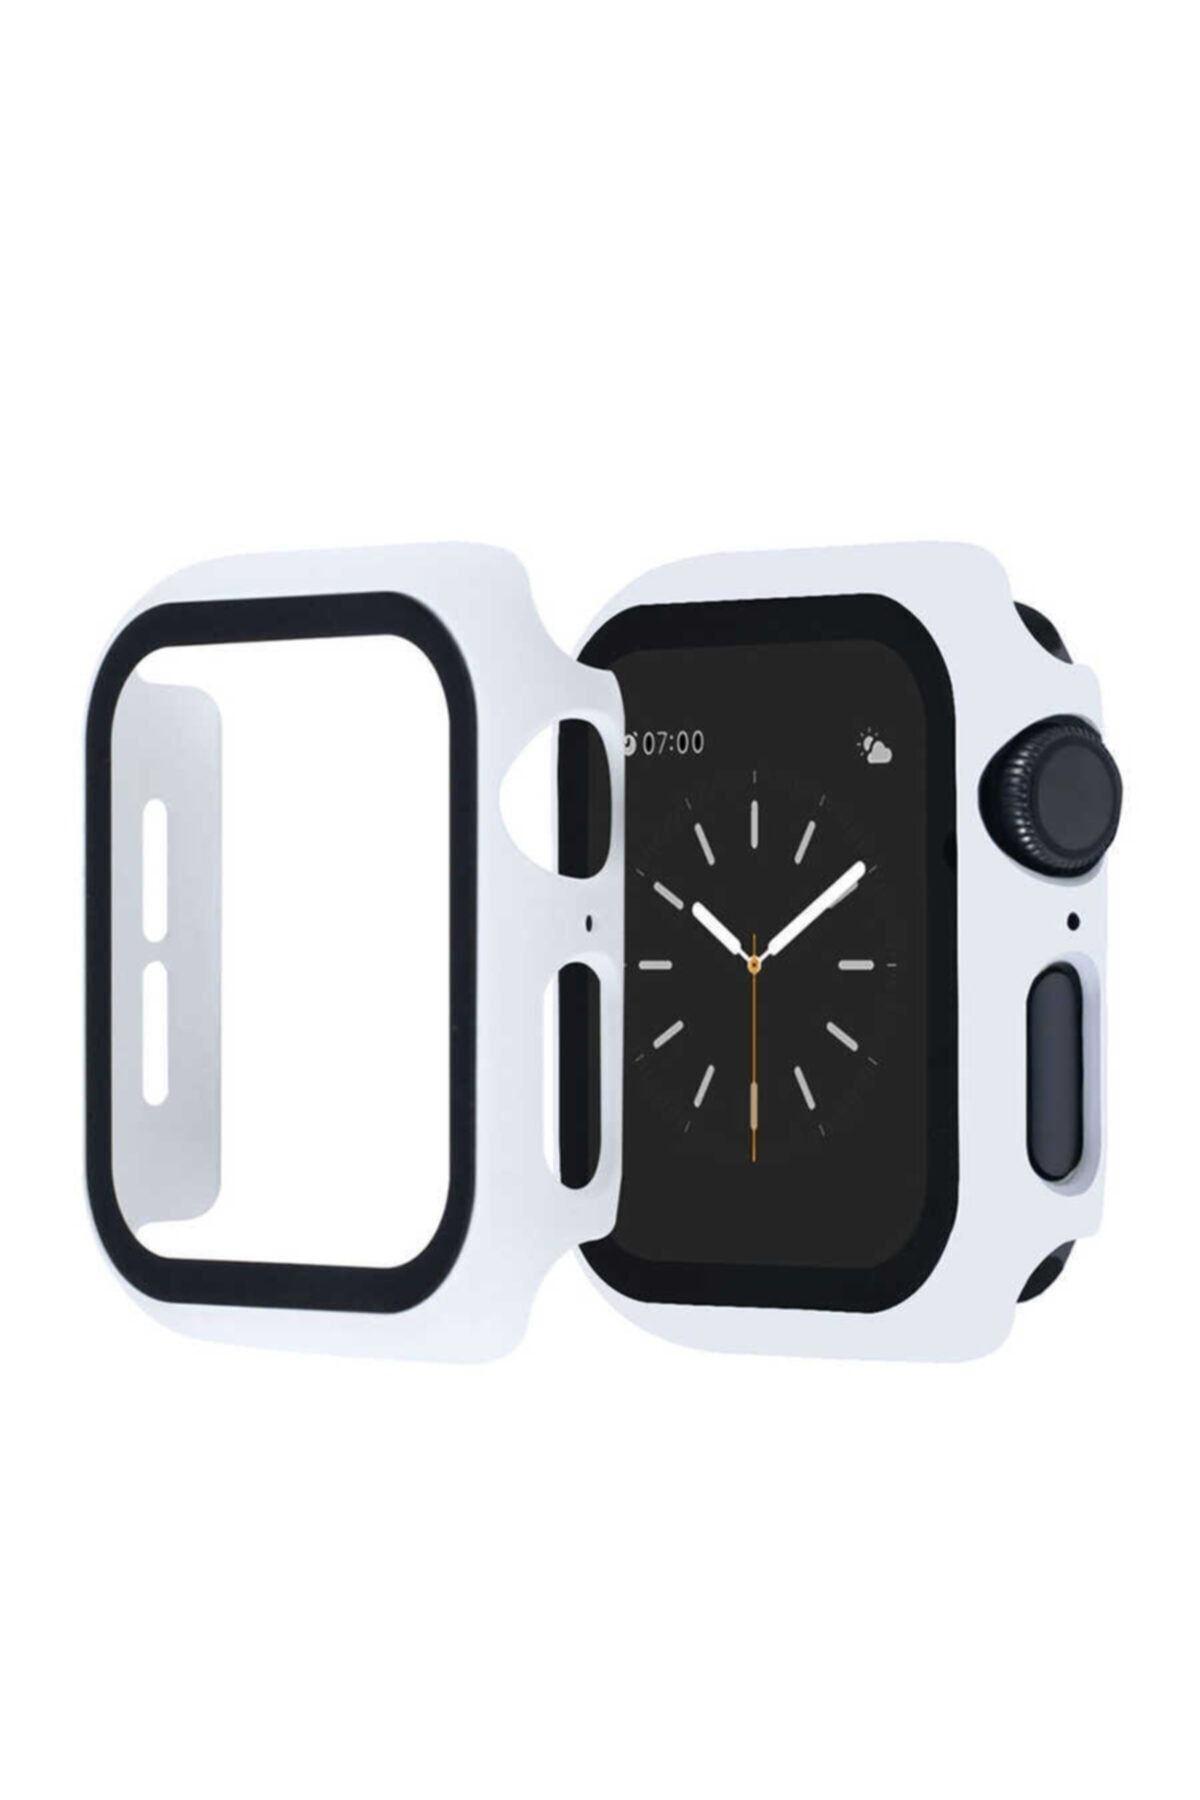 KVK PRİVACY Apple Watch Beyaz Uyumlu Silikon Kılıf 42mm 1